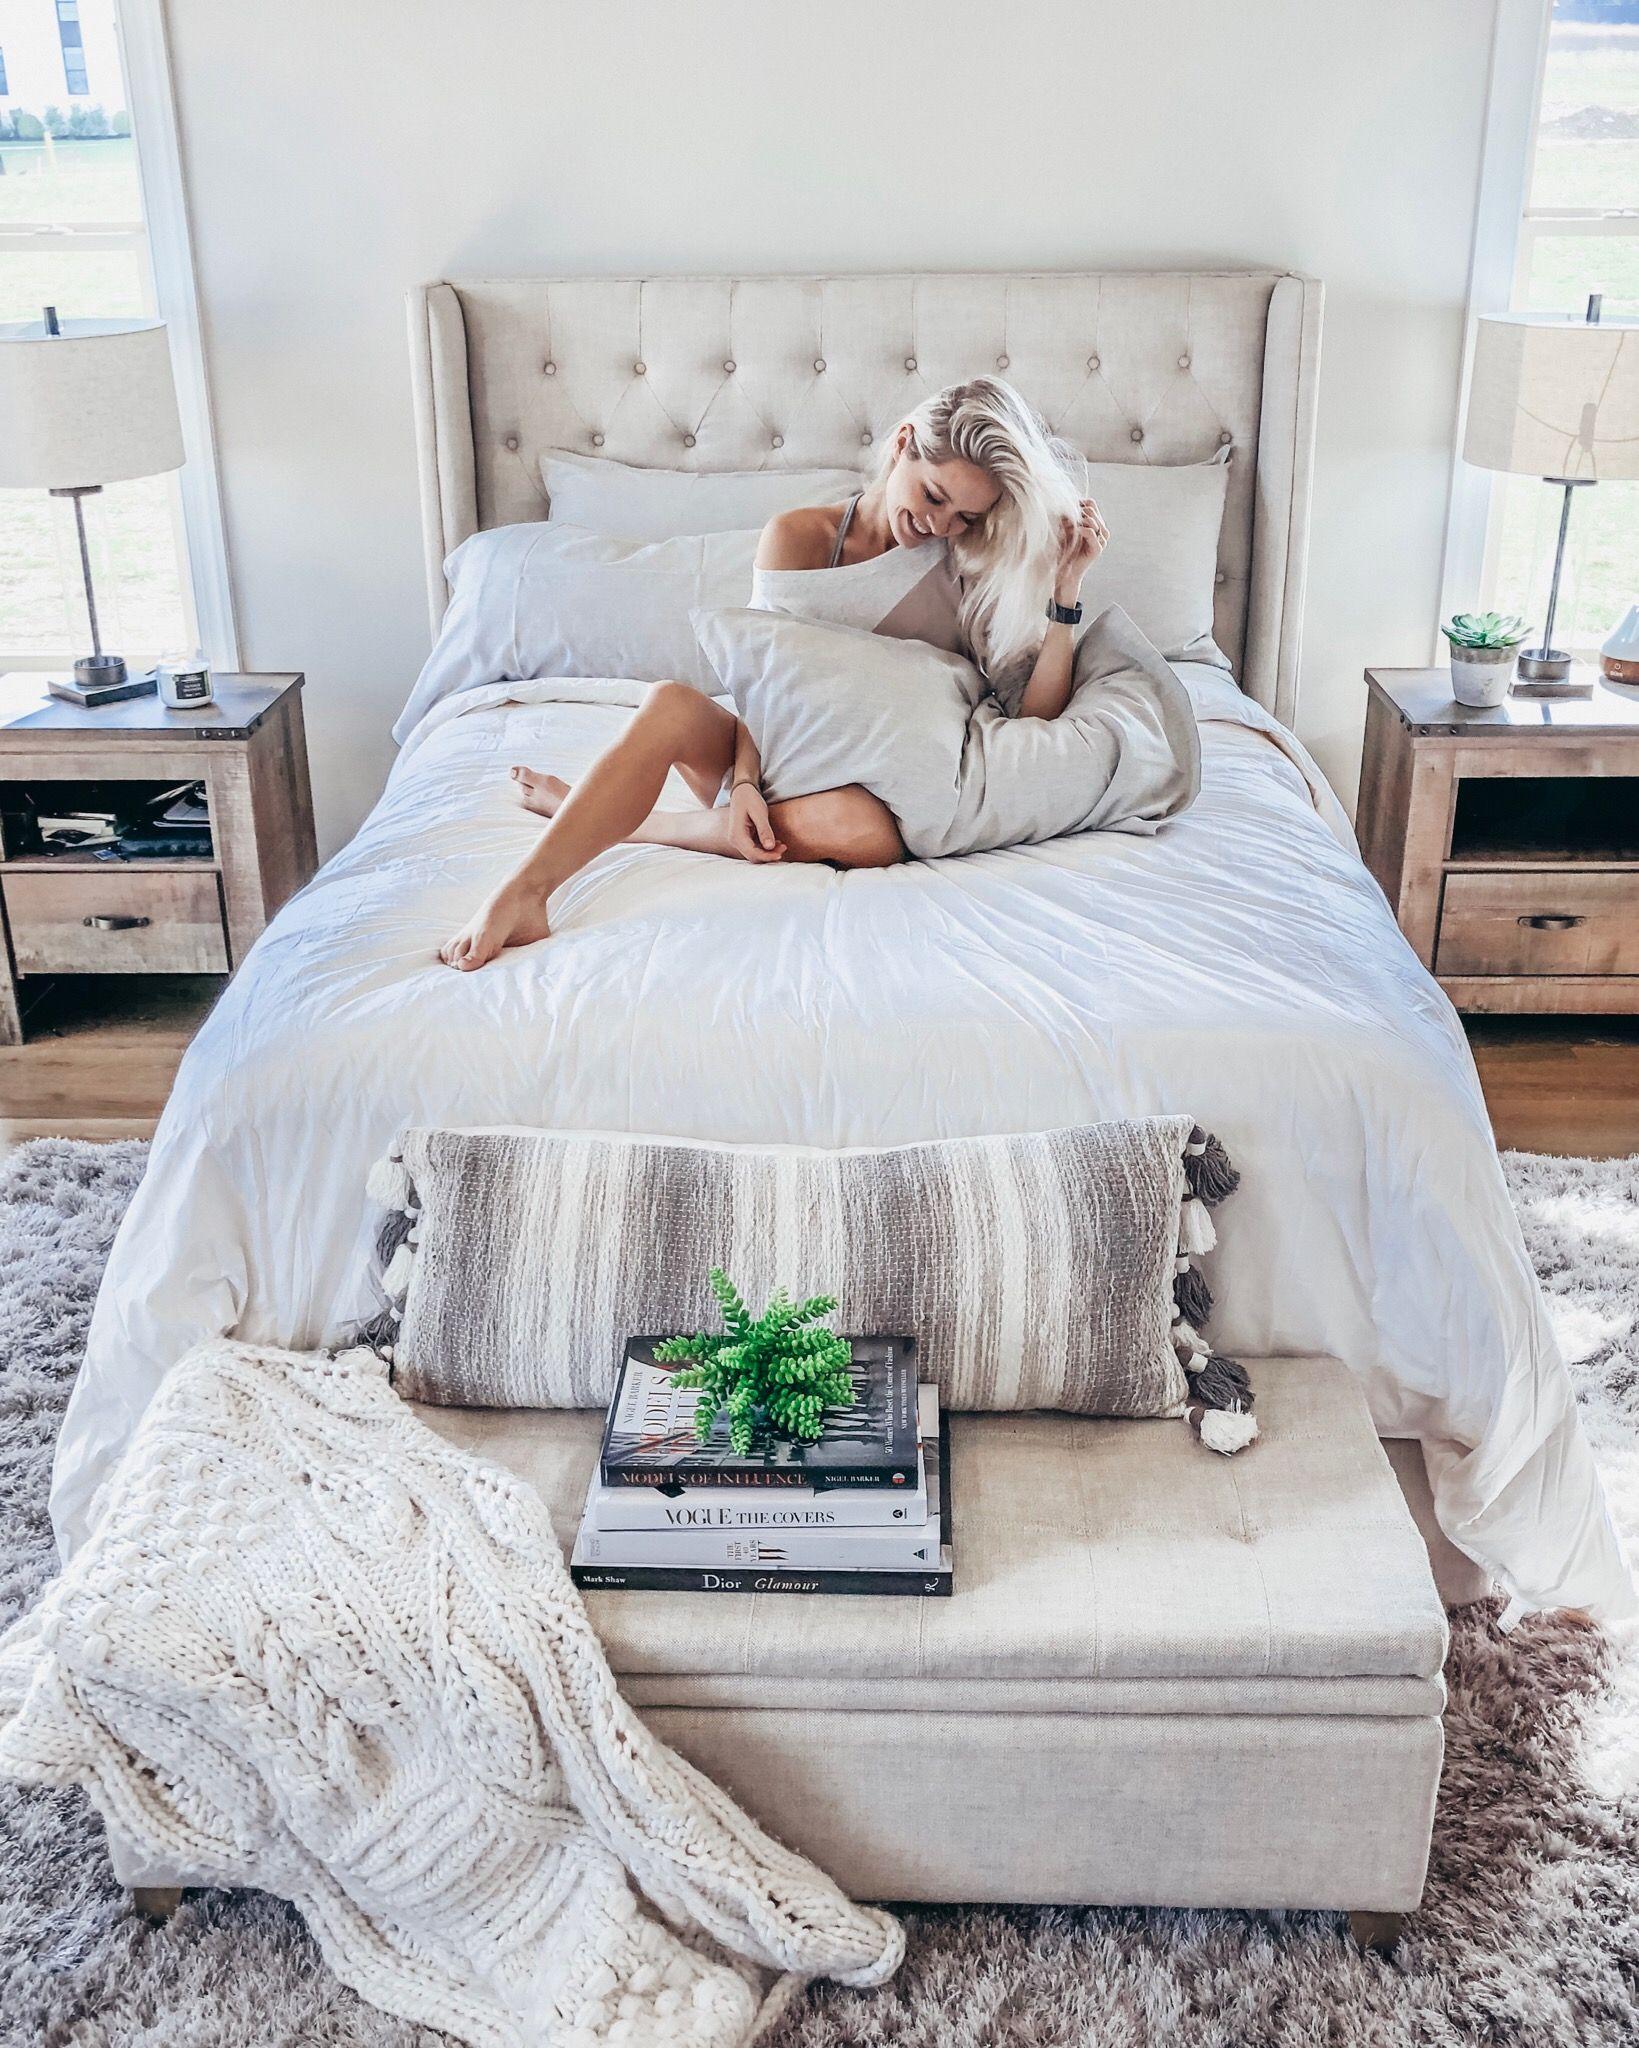 Pin By Tayna Carrada On Liketoknow It Home Decor Bedroom Bedroom Makeover Home Bedroom